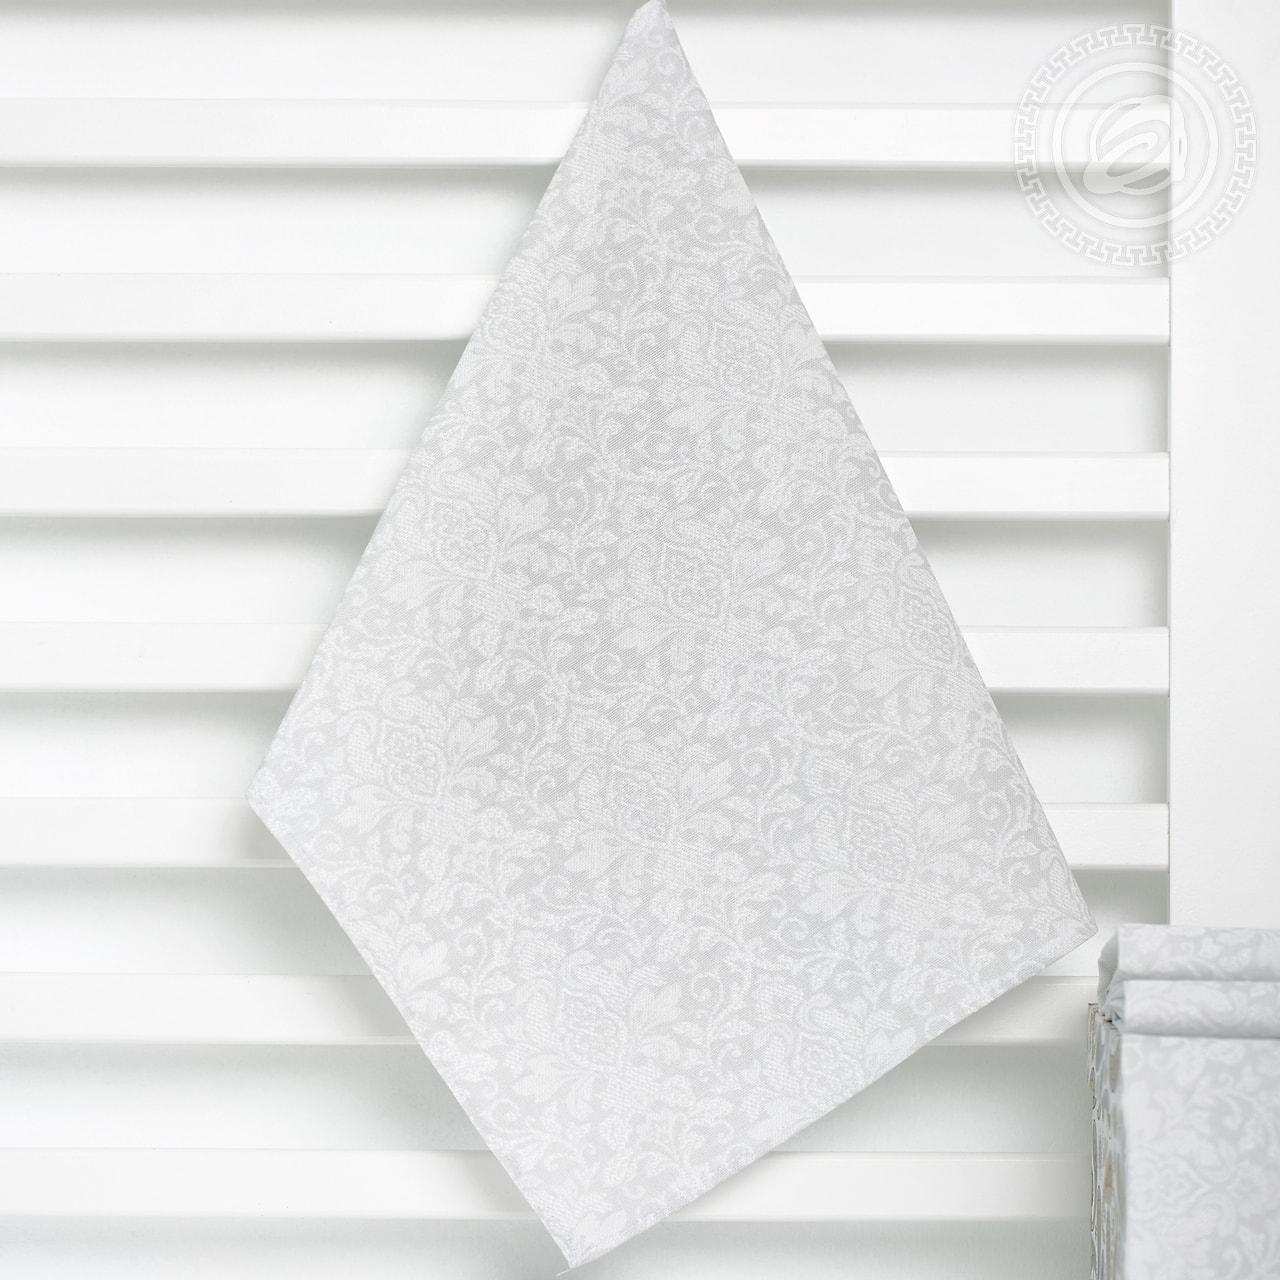 Кухонное полотенце Грандсток 11479144 от Grandstock